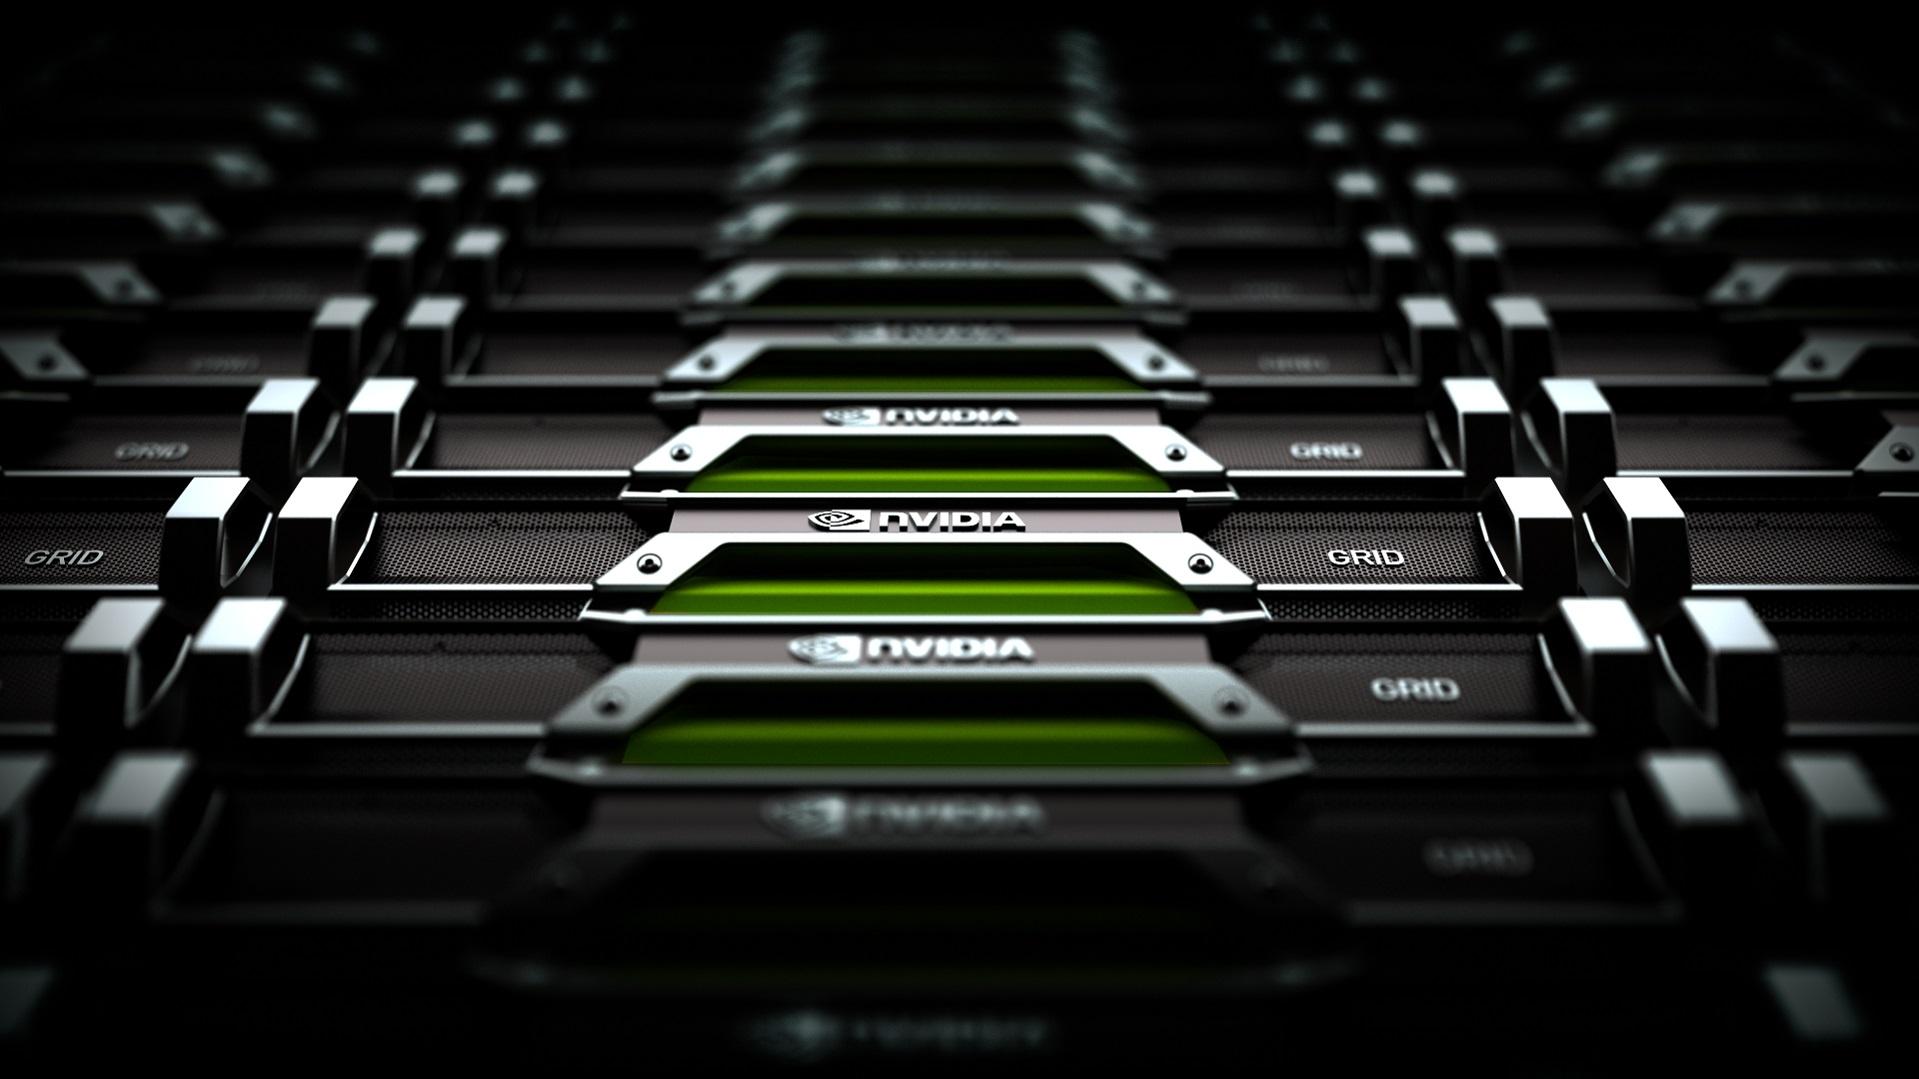 nvidia-data-center-grid